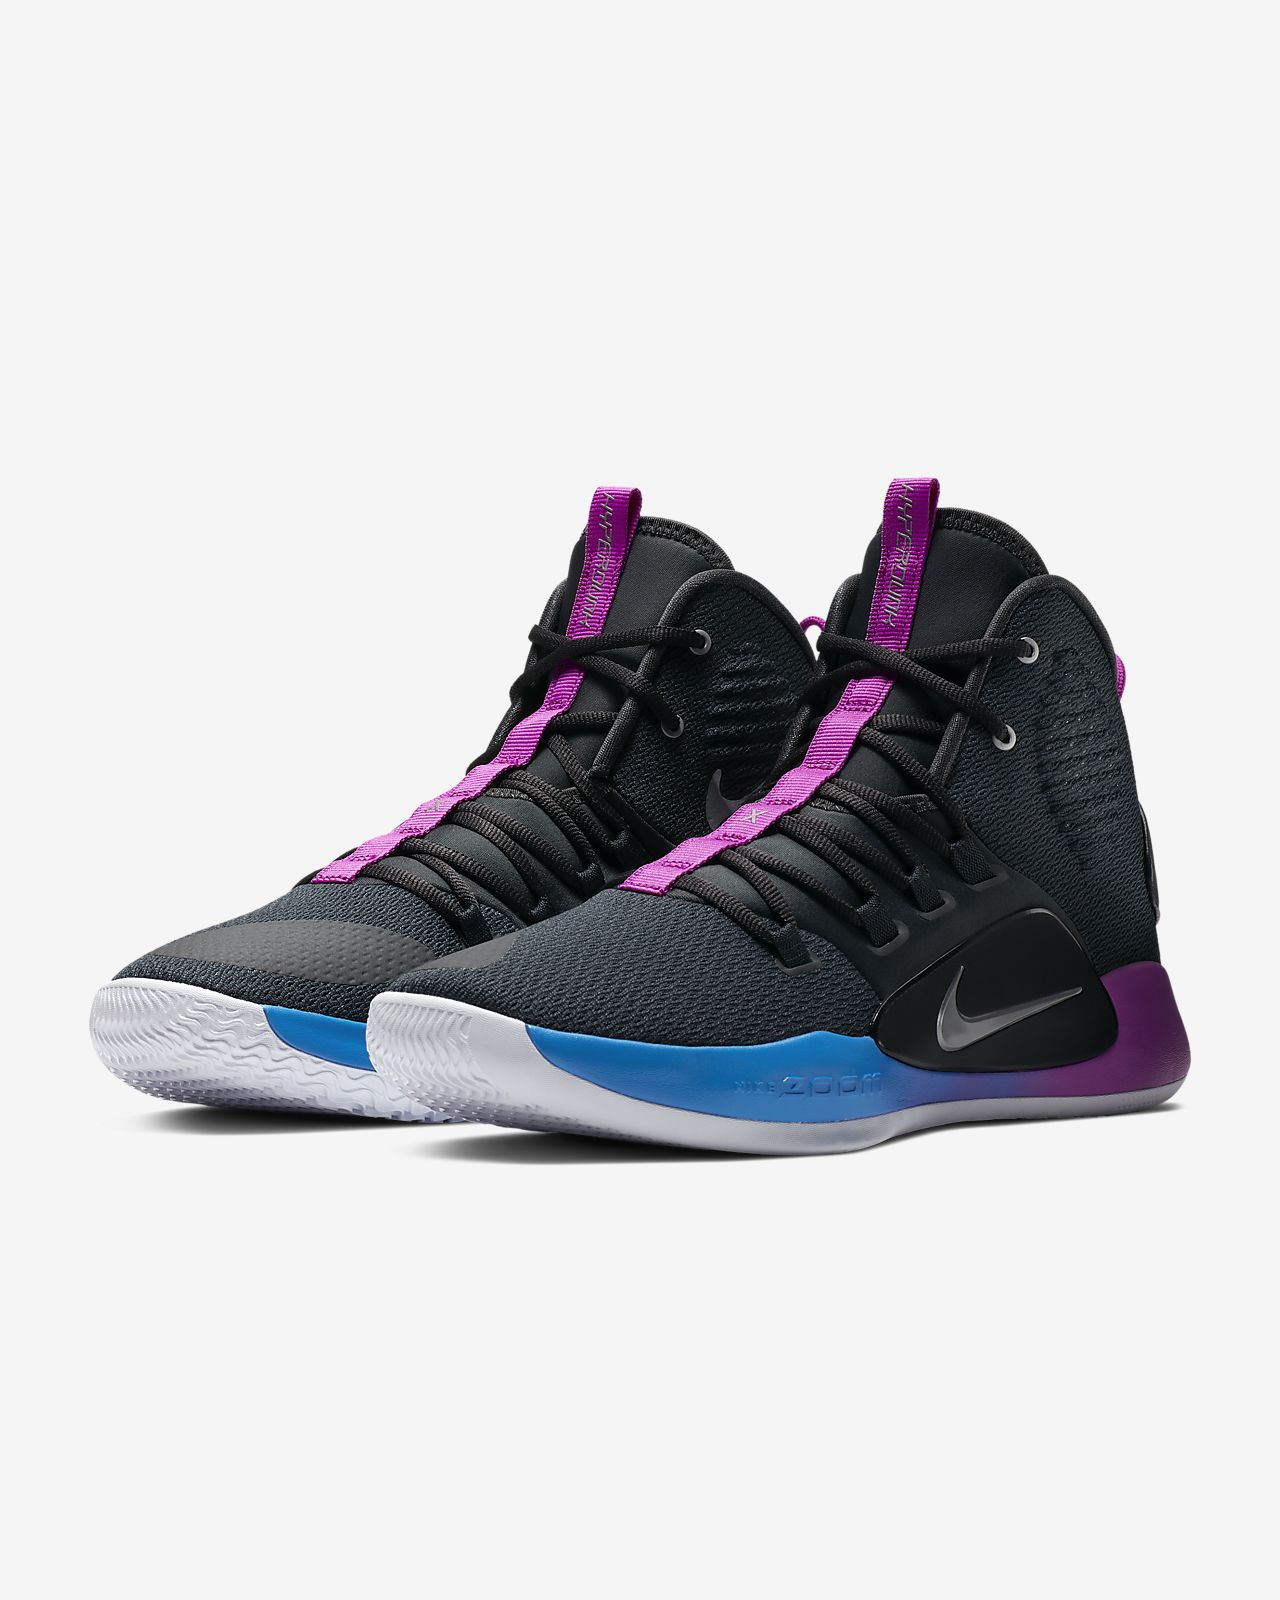 newest collection 1e57c b61bd ... Nike Hyperdunk X Basketball Shoe